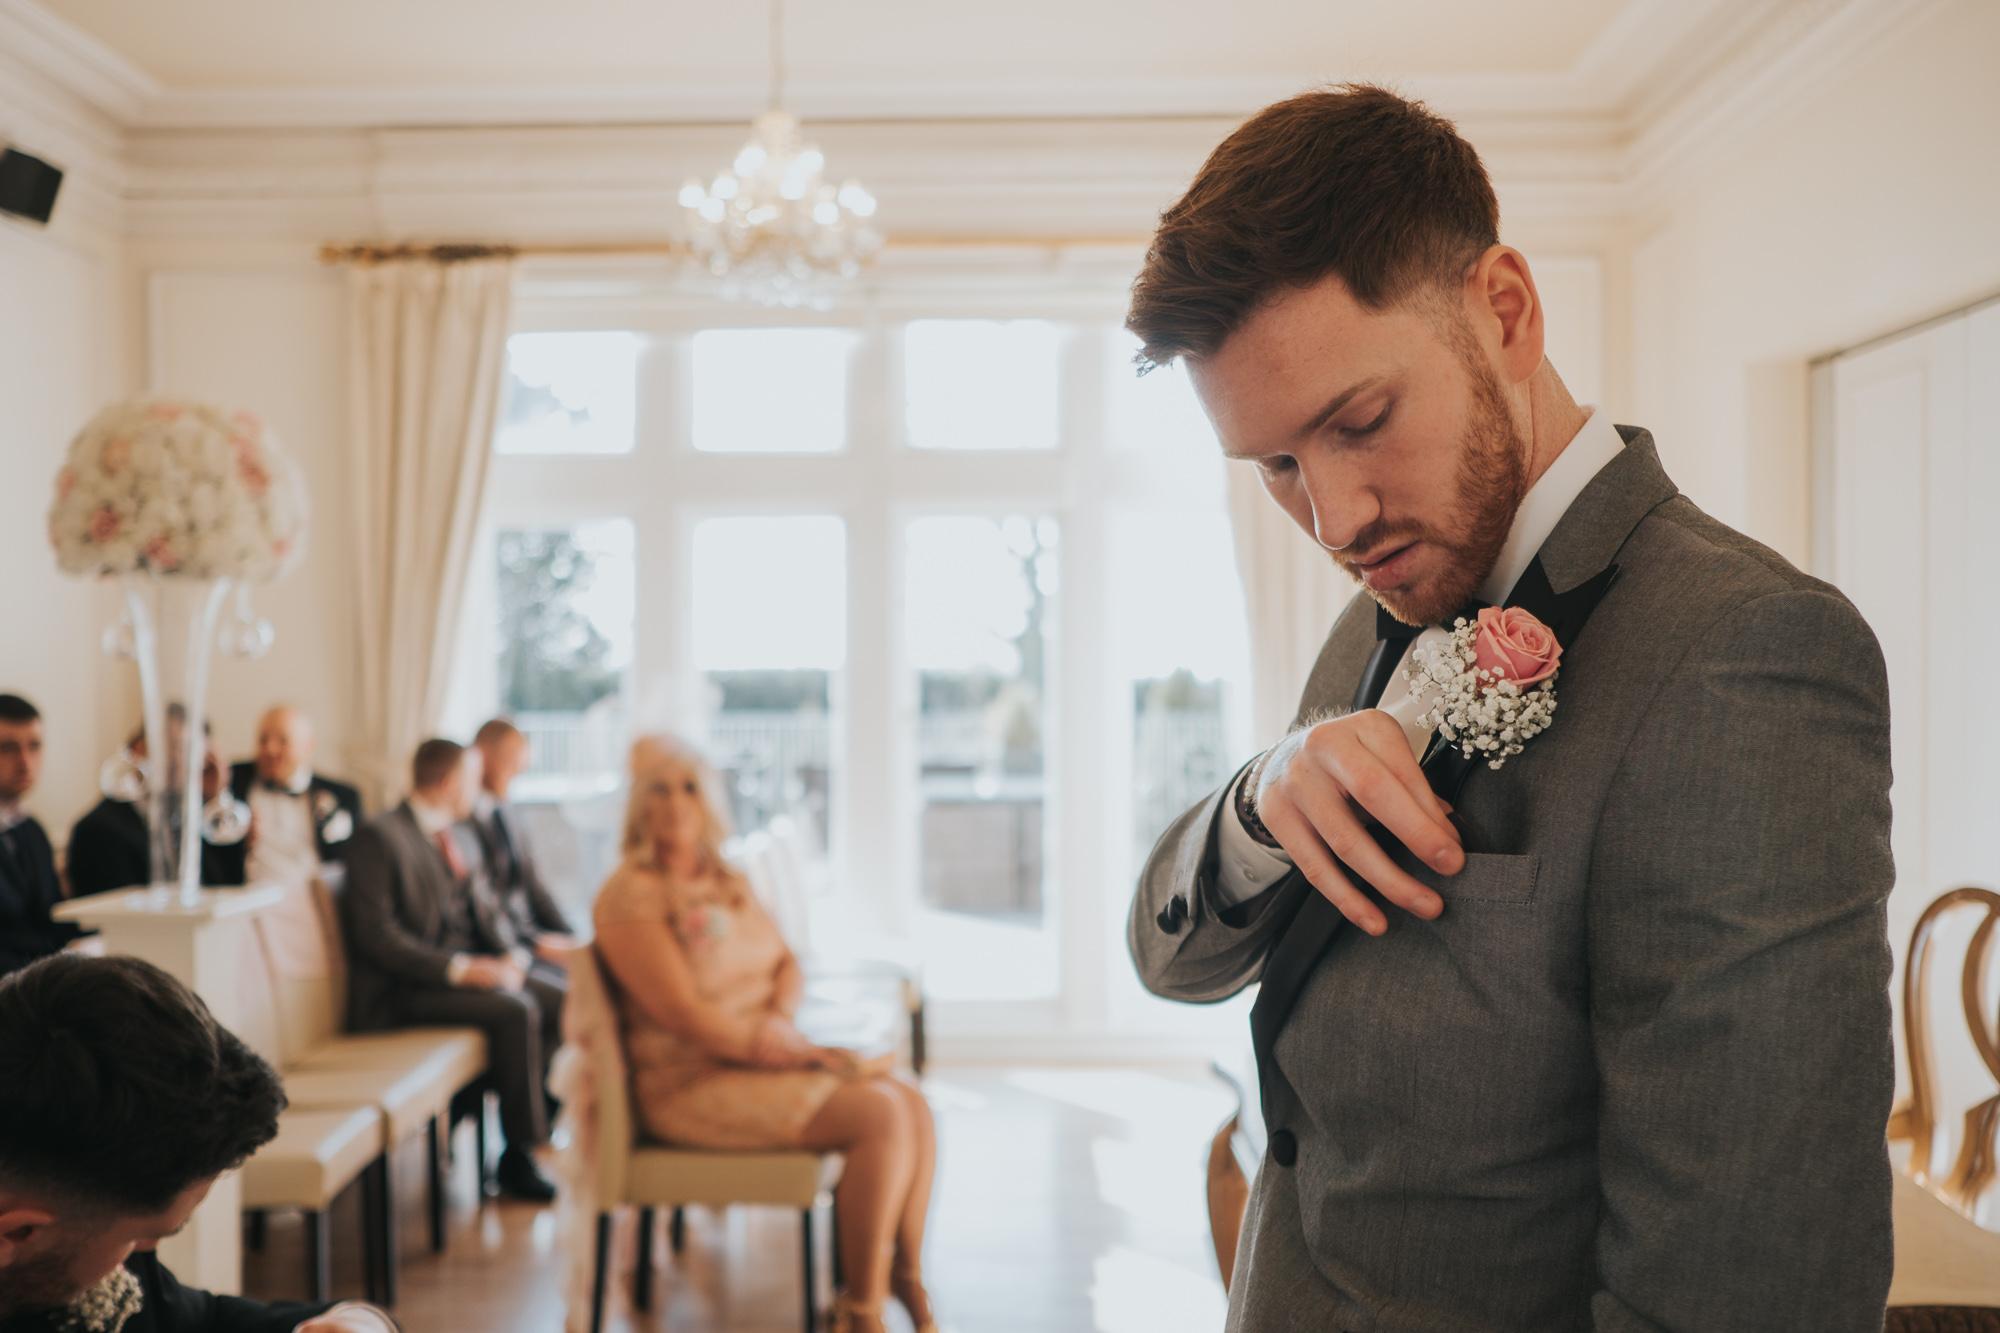 West Tower Exclusive Wedding Venue wedding photography merseyside and lancashire wedding photographer (22 of 60).jpg